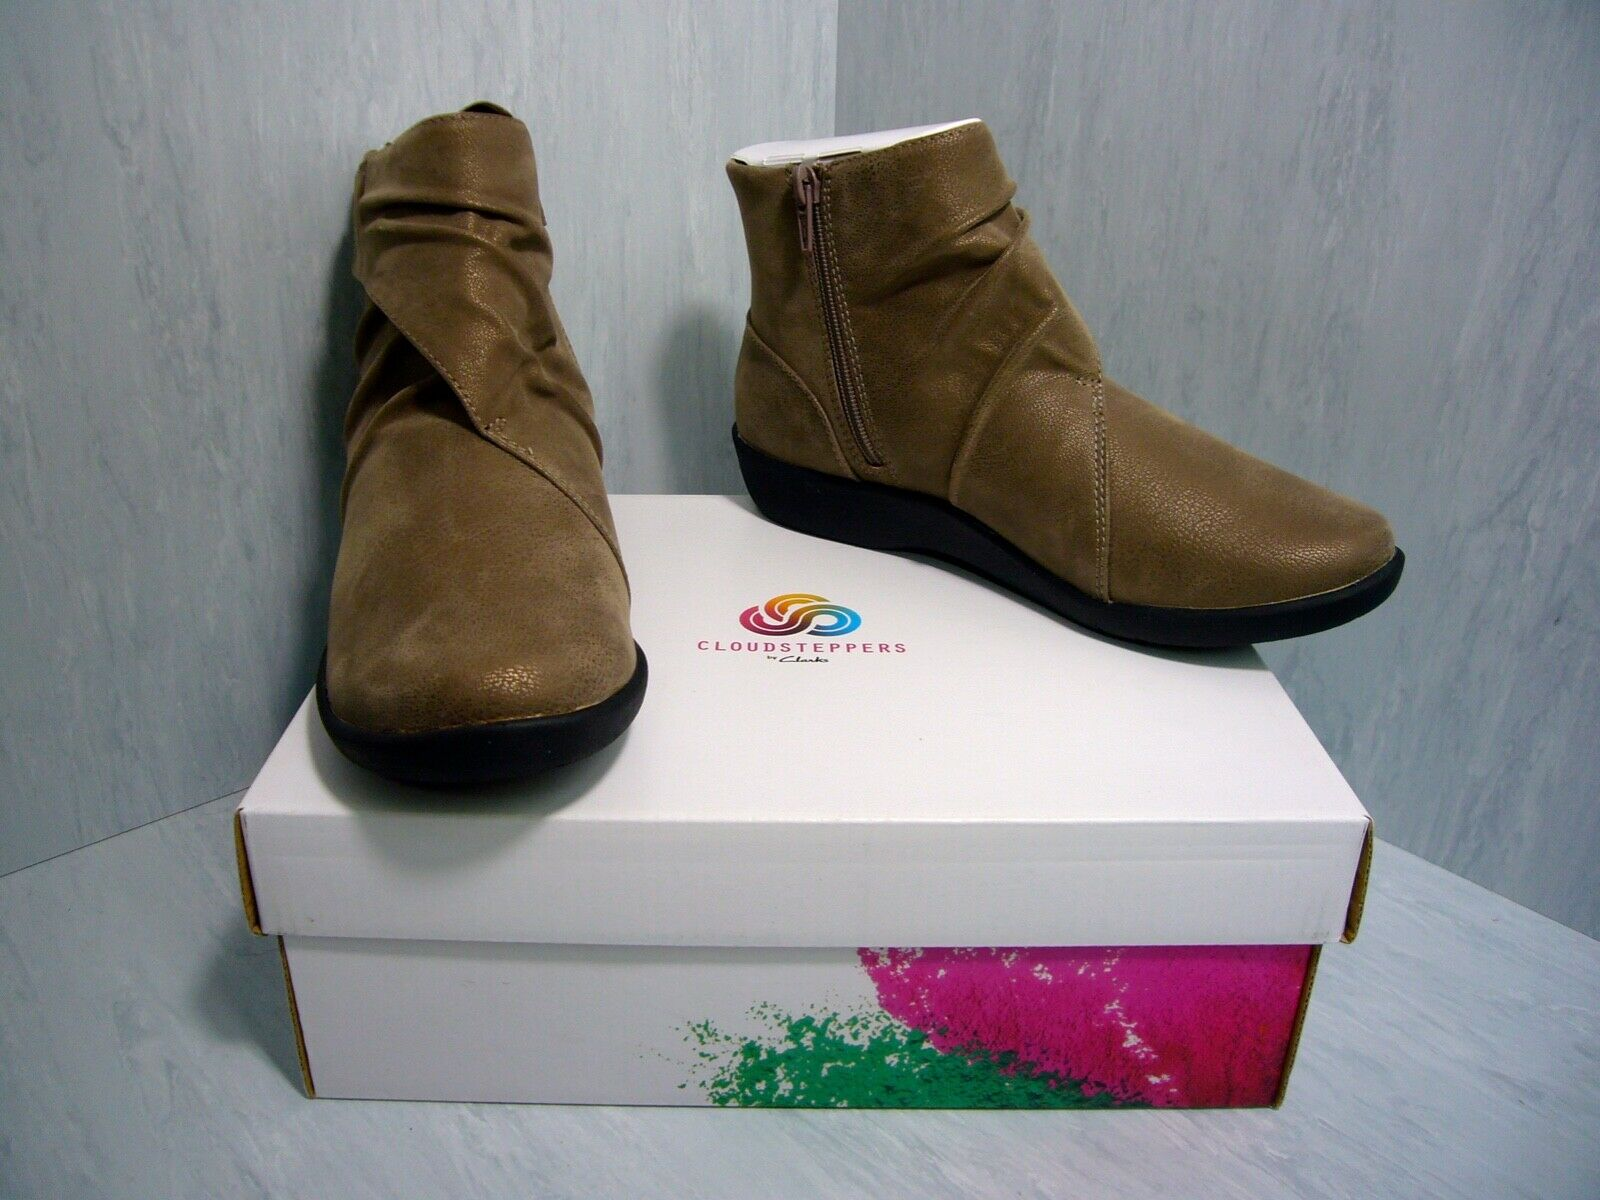 Nuevo con caja Clarks cloudsteppers Sillian Tana Tobillo botas Botín De Estaño M